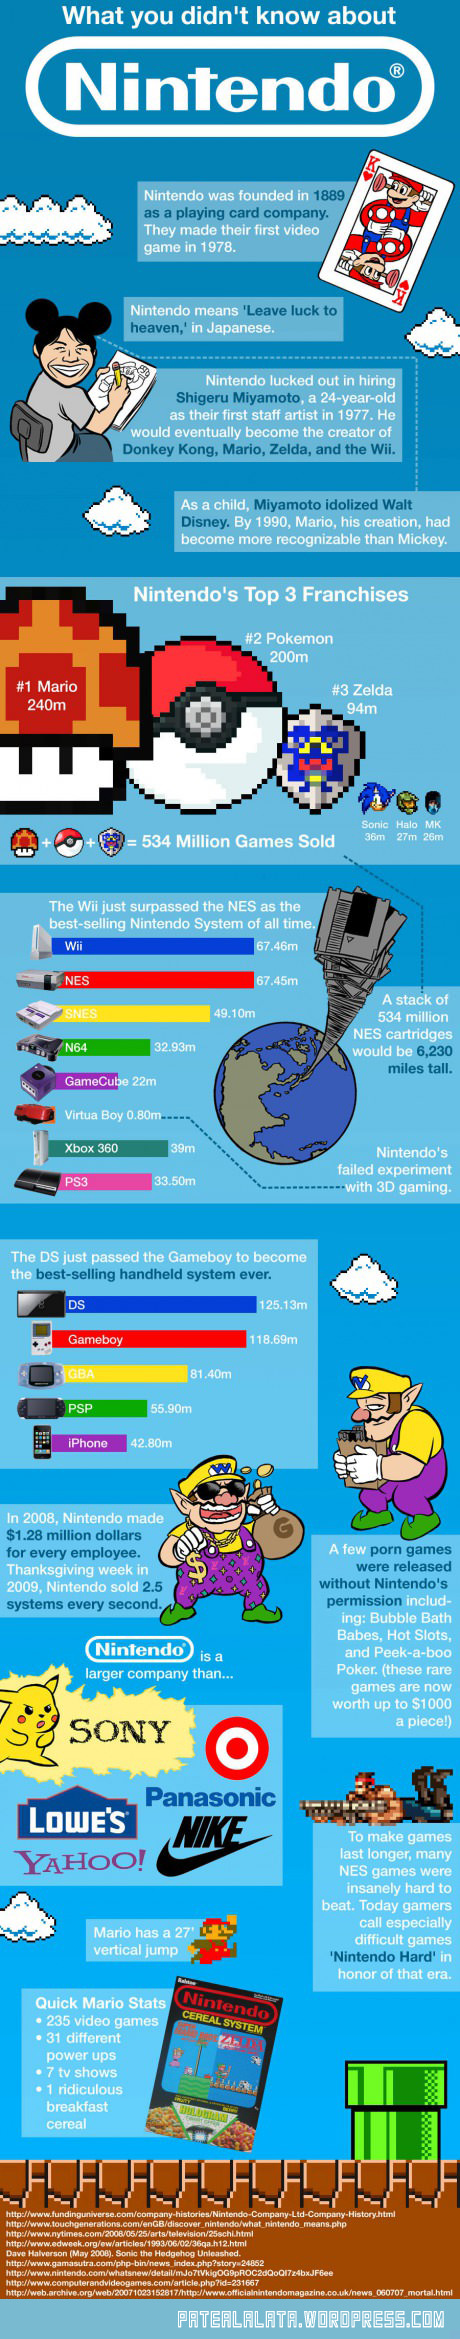 cool-Nintendo-stats-fact